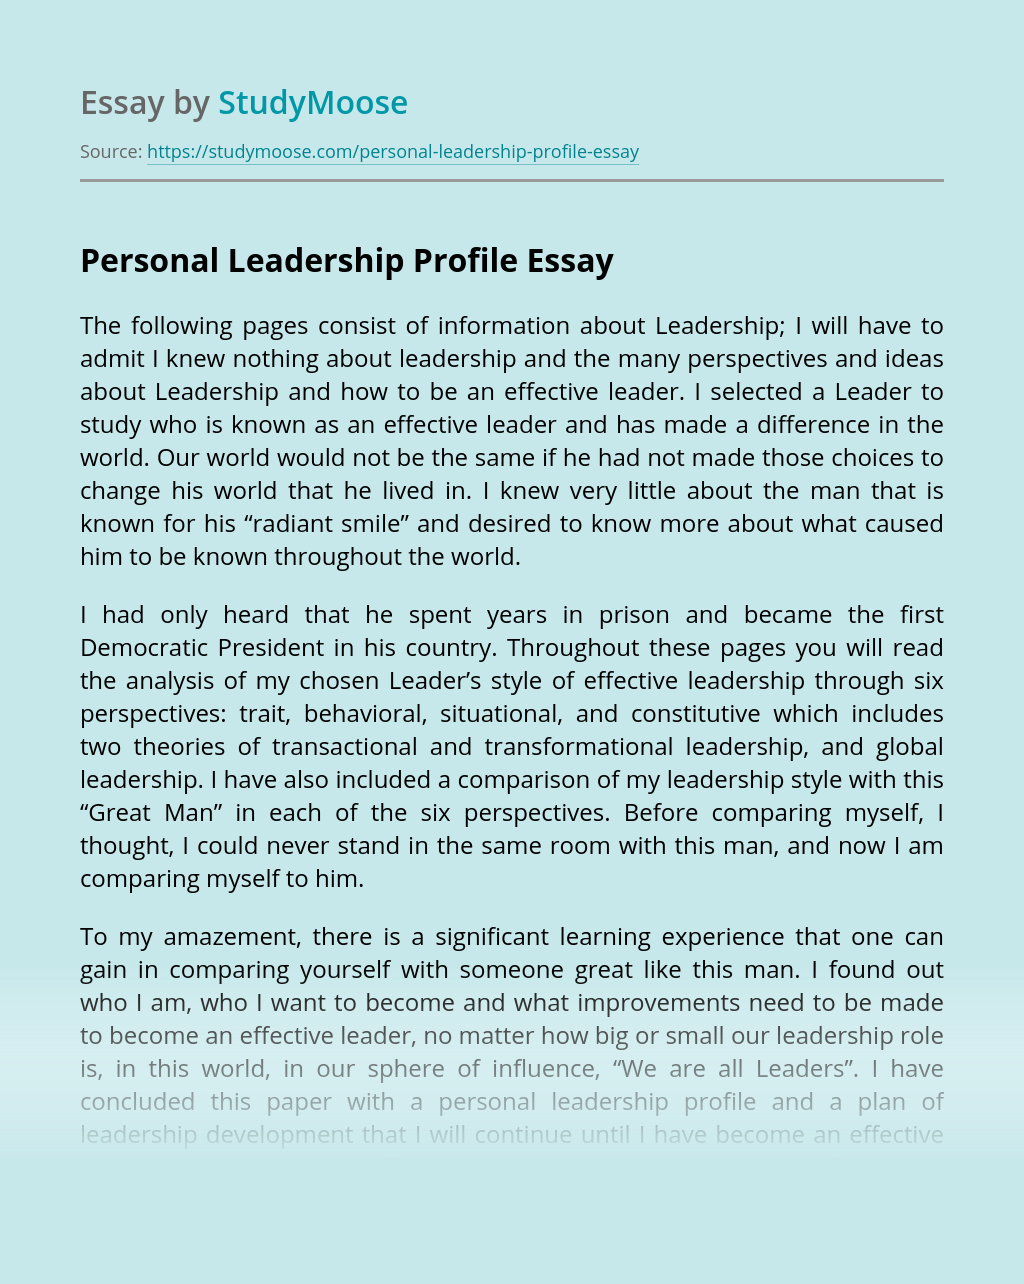 Personal Leadership Profile